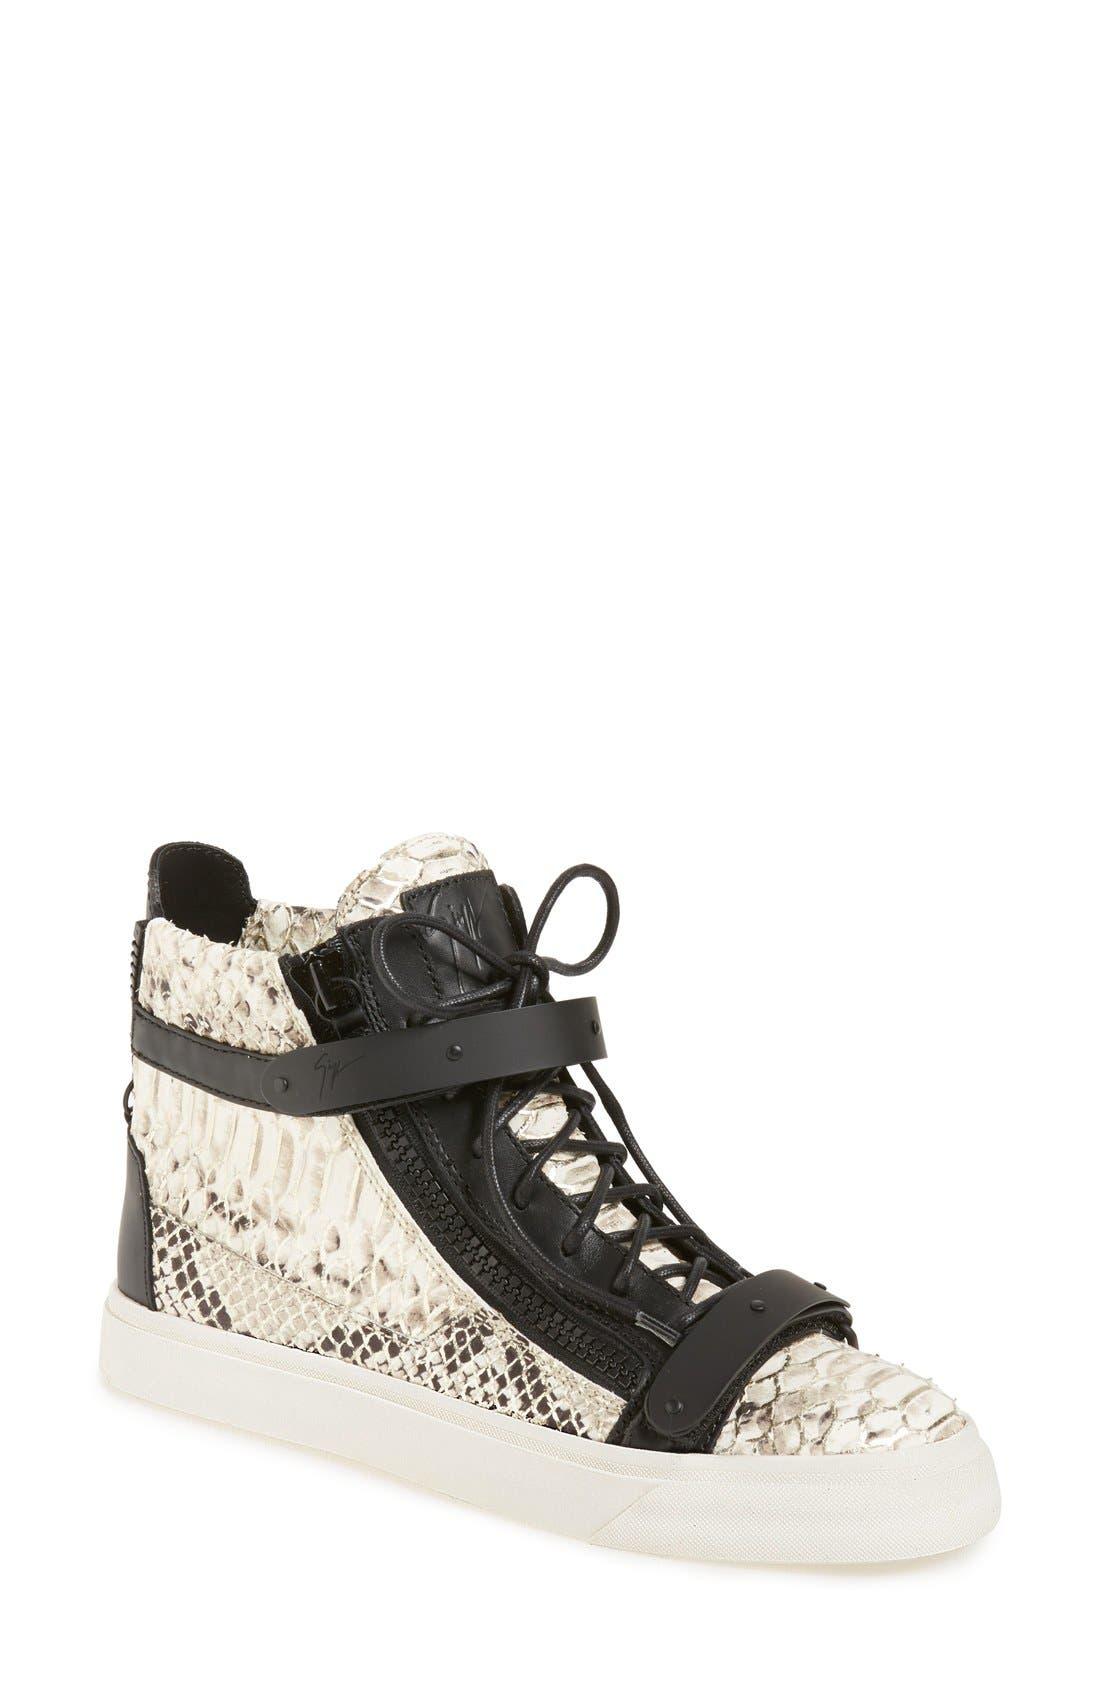 Main Image - Giuseppe Zanotti 'London' High Top Sneaker (Women)